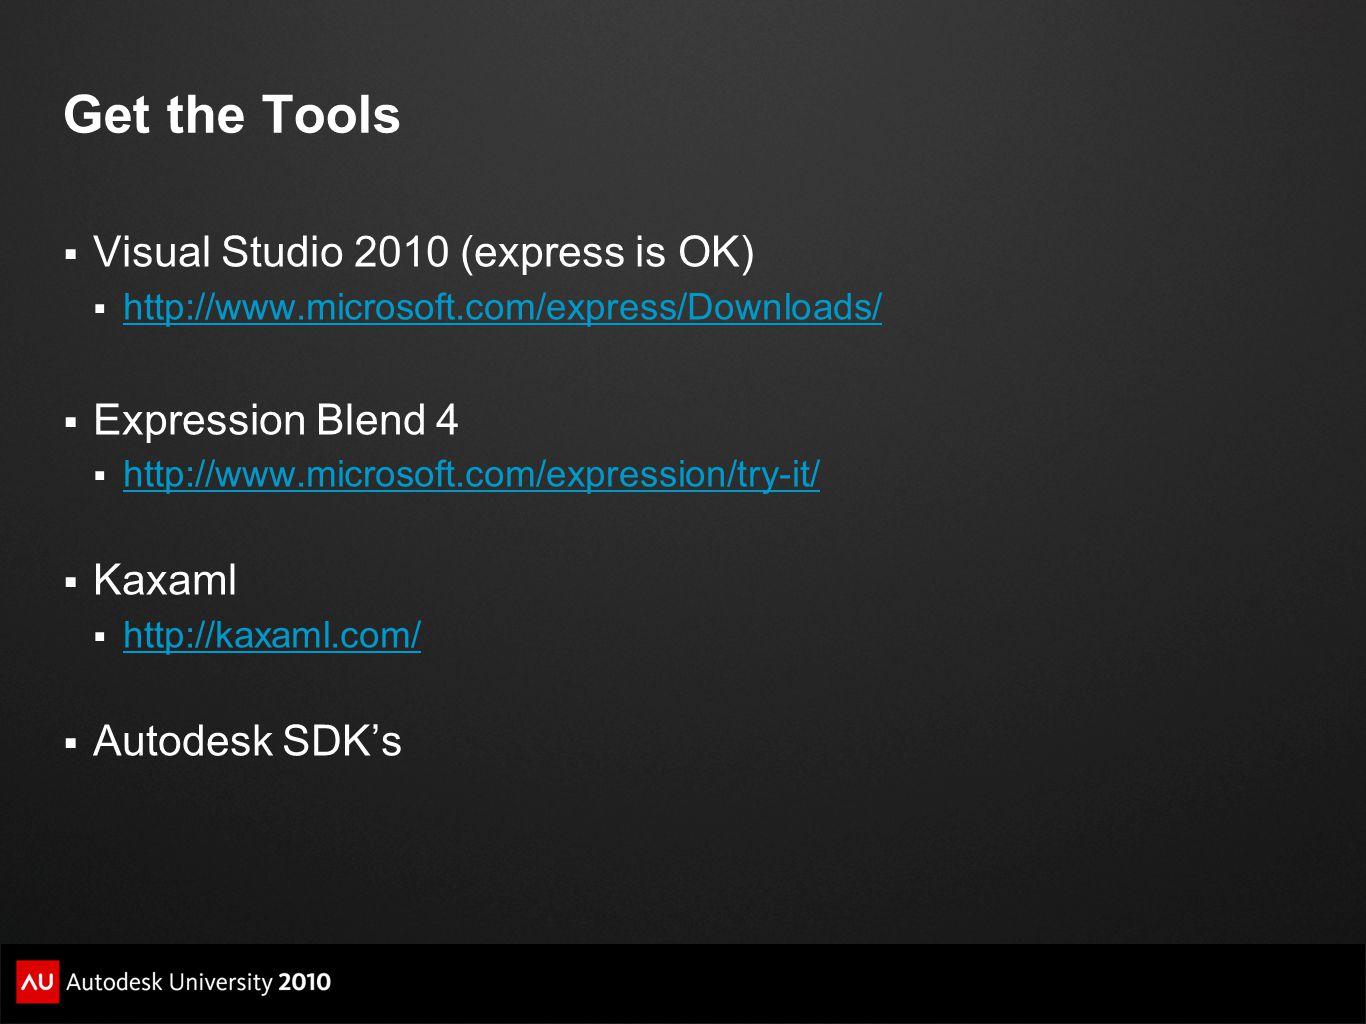 Get the Tools Visual Studio 2010 (express is OK) http://www.microsoft.com/express/Downloads/ Expression Blend 4 http://www.microsoft.com/expression/try-it/ Kaxaml http://kaxaml.com/ Autodesk SDKs